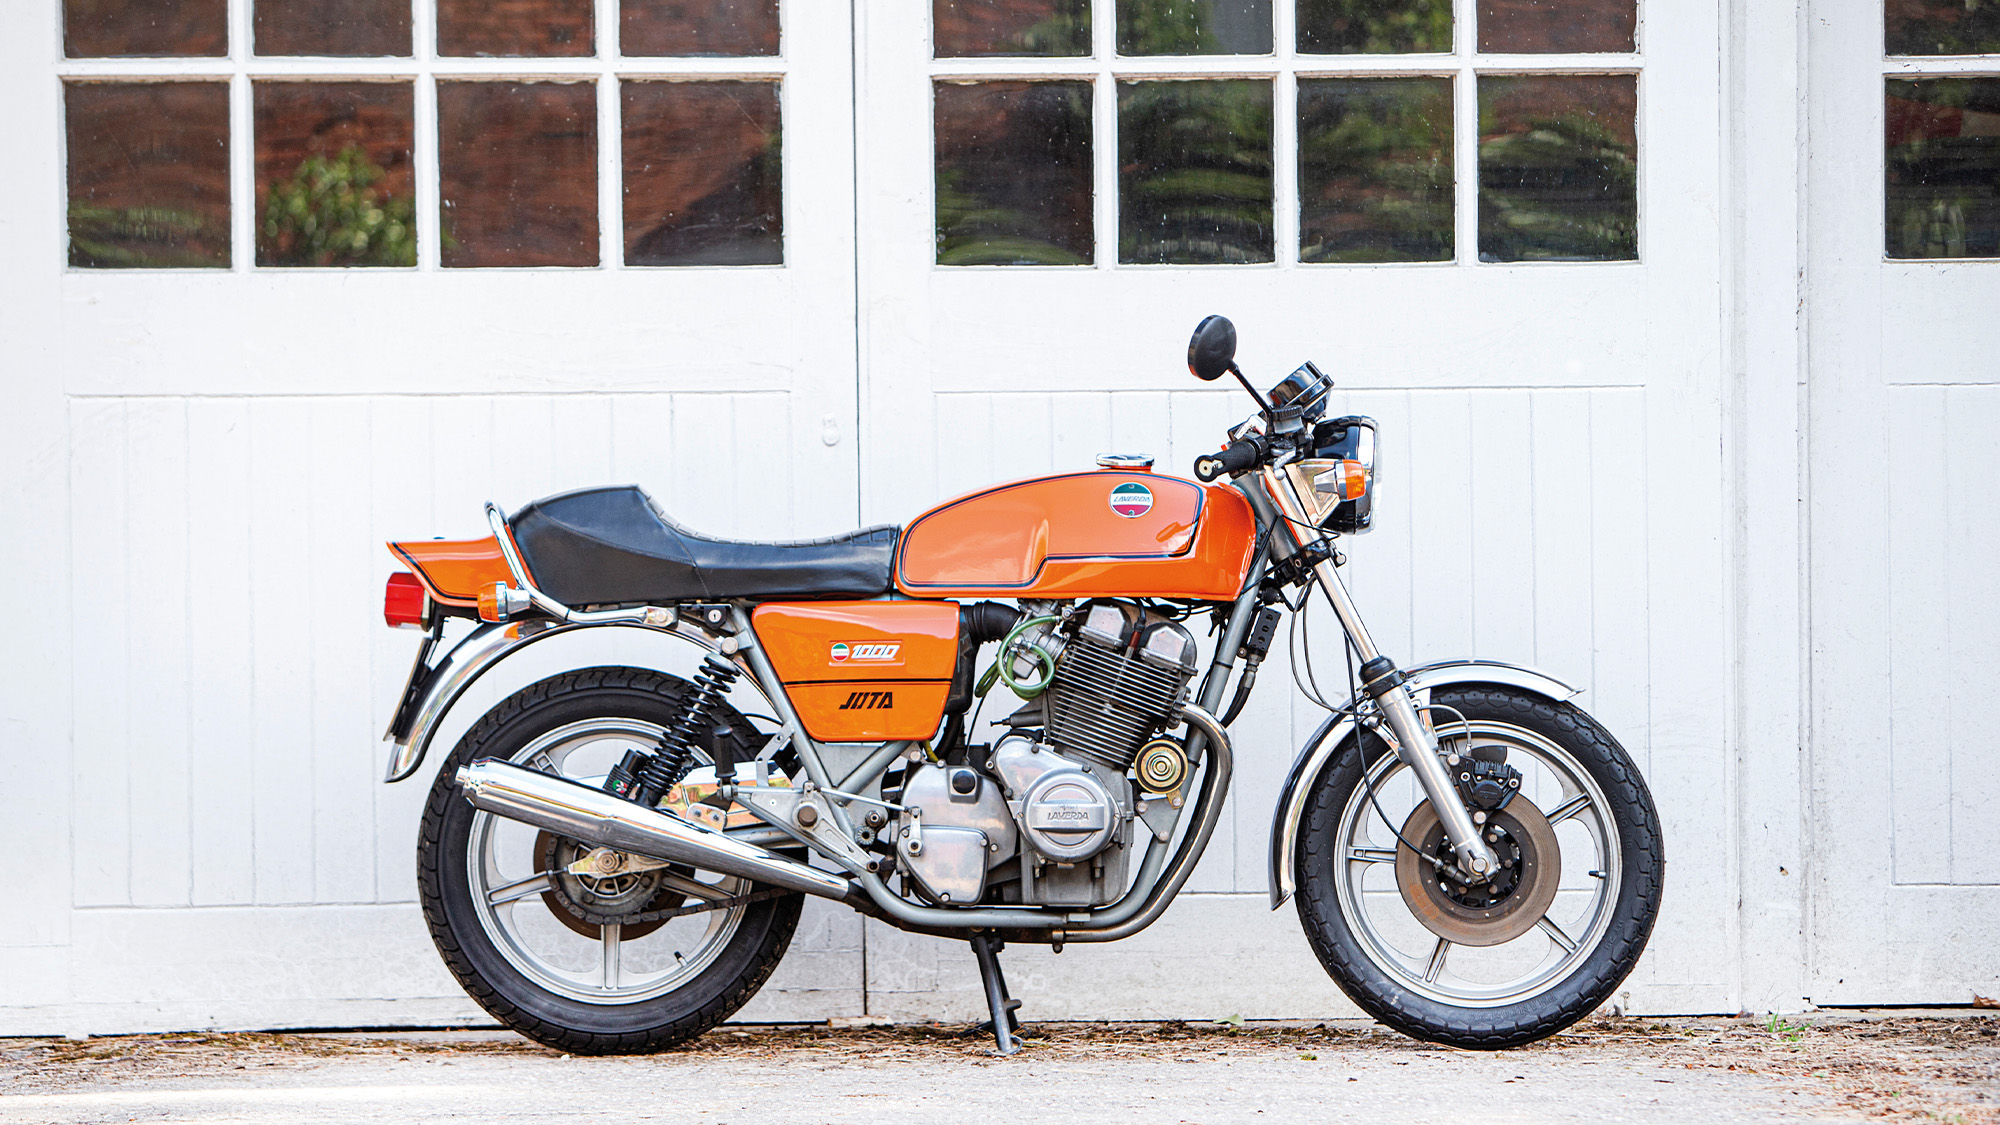 Side view of a 1981 Laverda Jota 180 motorbike